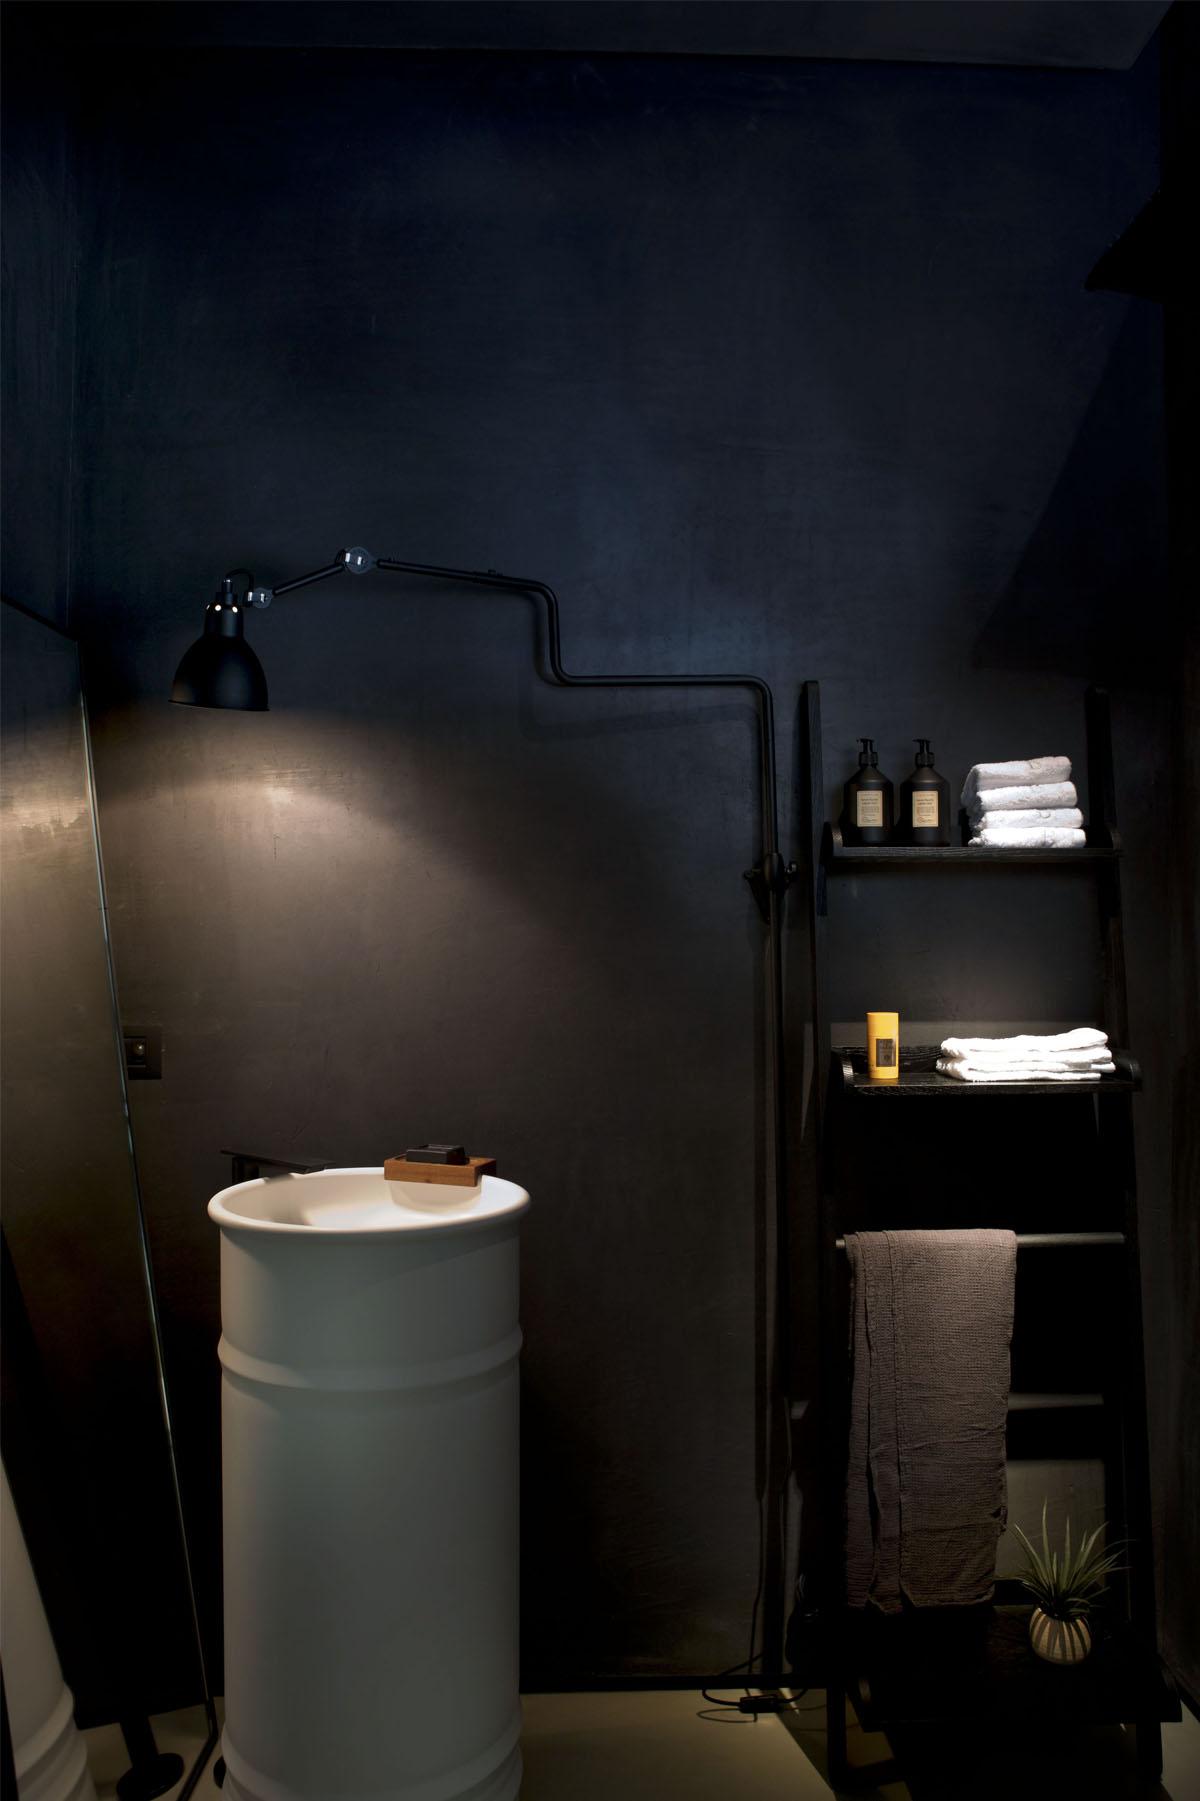 14 bonucci Sleek Modern by Fabio Fantolino